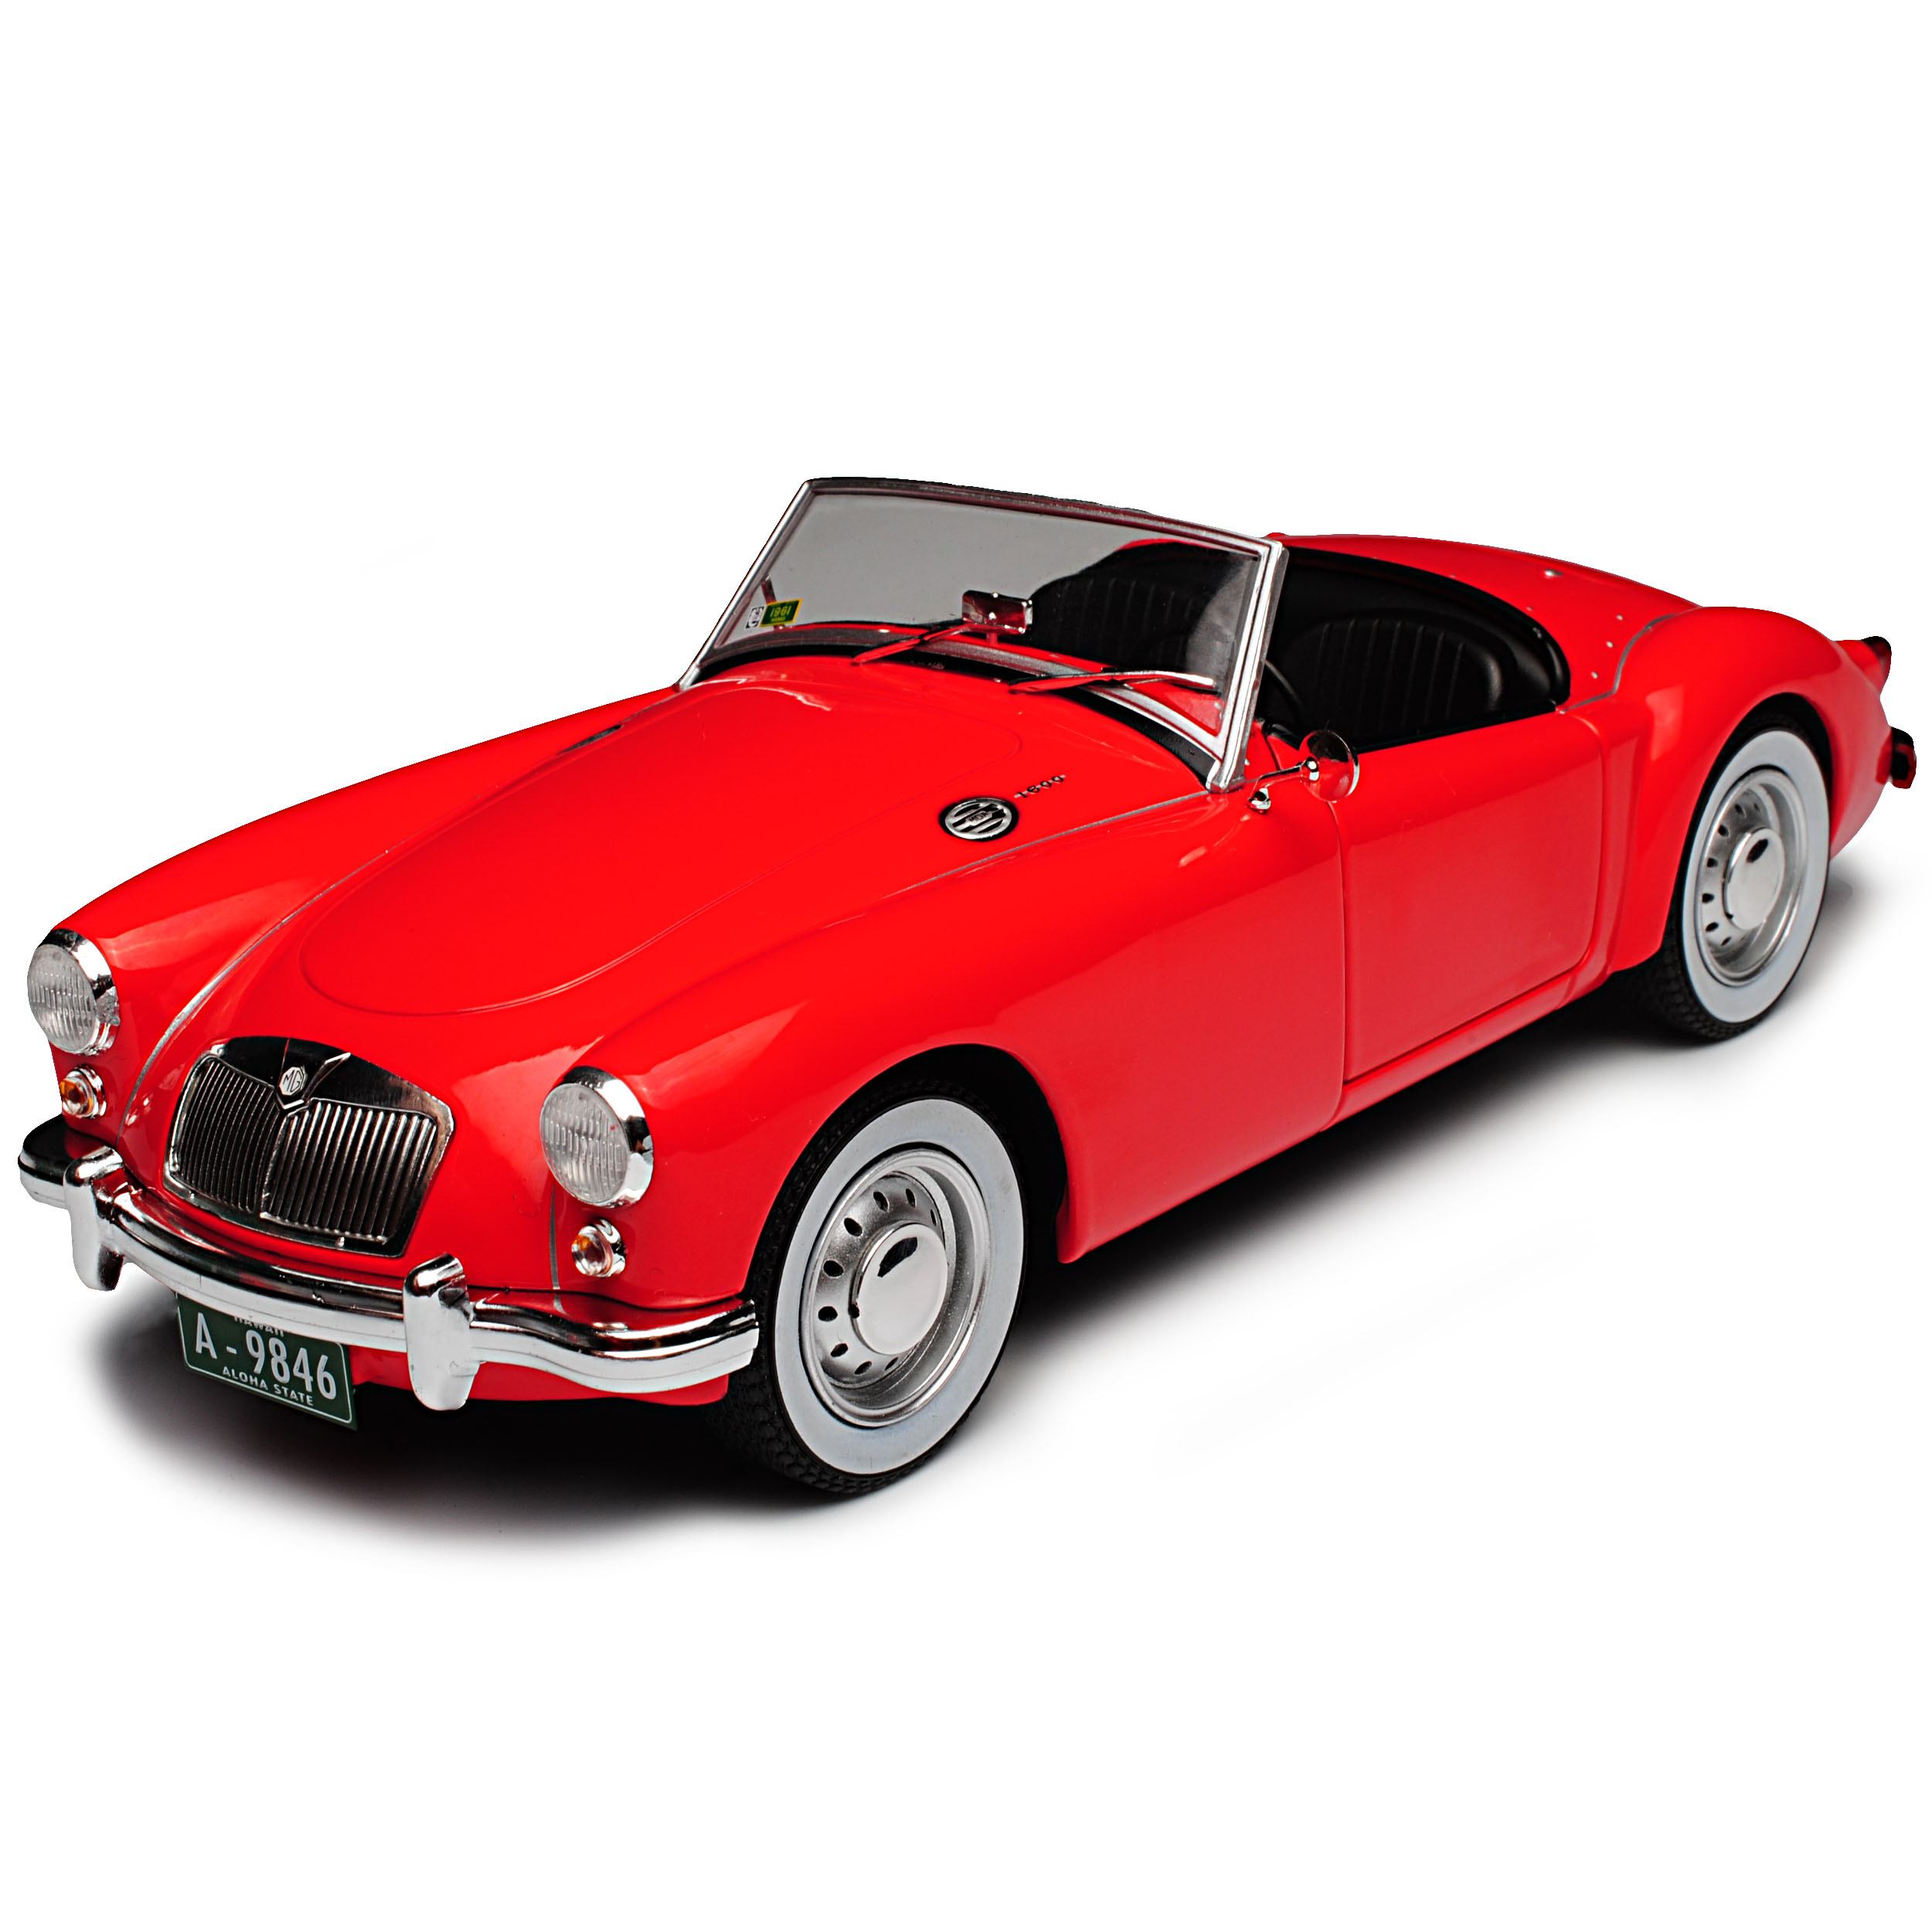 Mg a MGA MKII a1600 ROADSTER Cabrio Rosso Elvis Presley 1955-1962 1//18 greenligh...